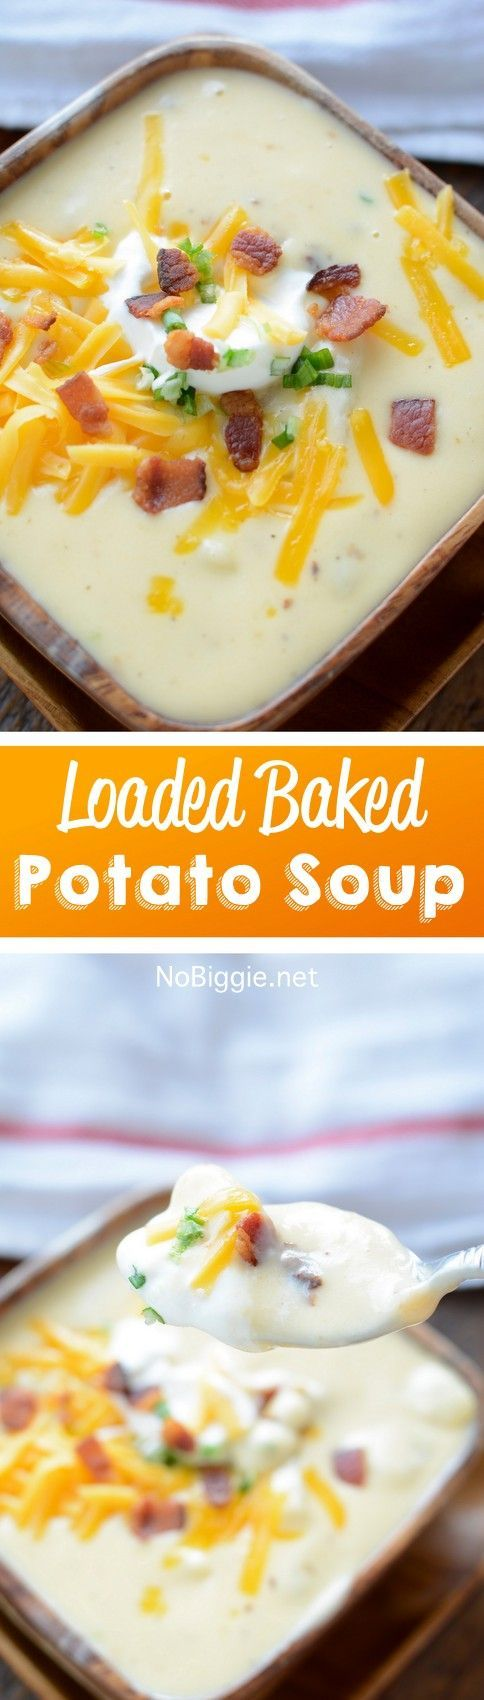 loaded baked potato soup recipe | http://NoBiggie.net